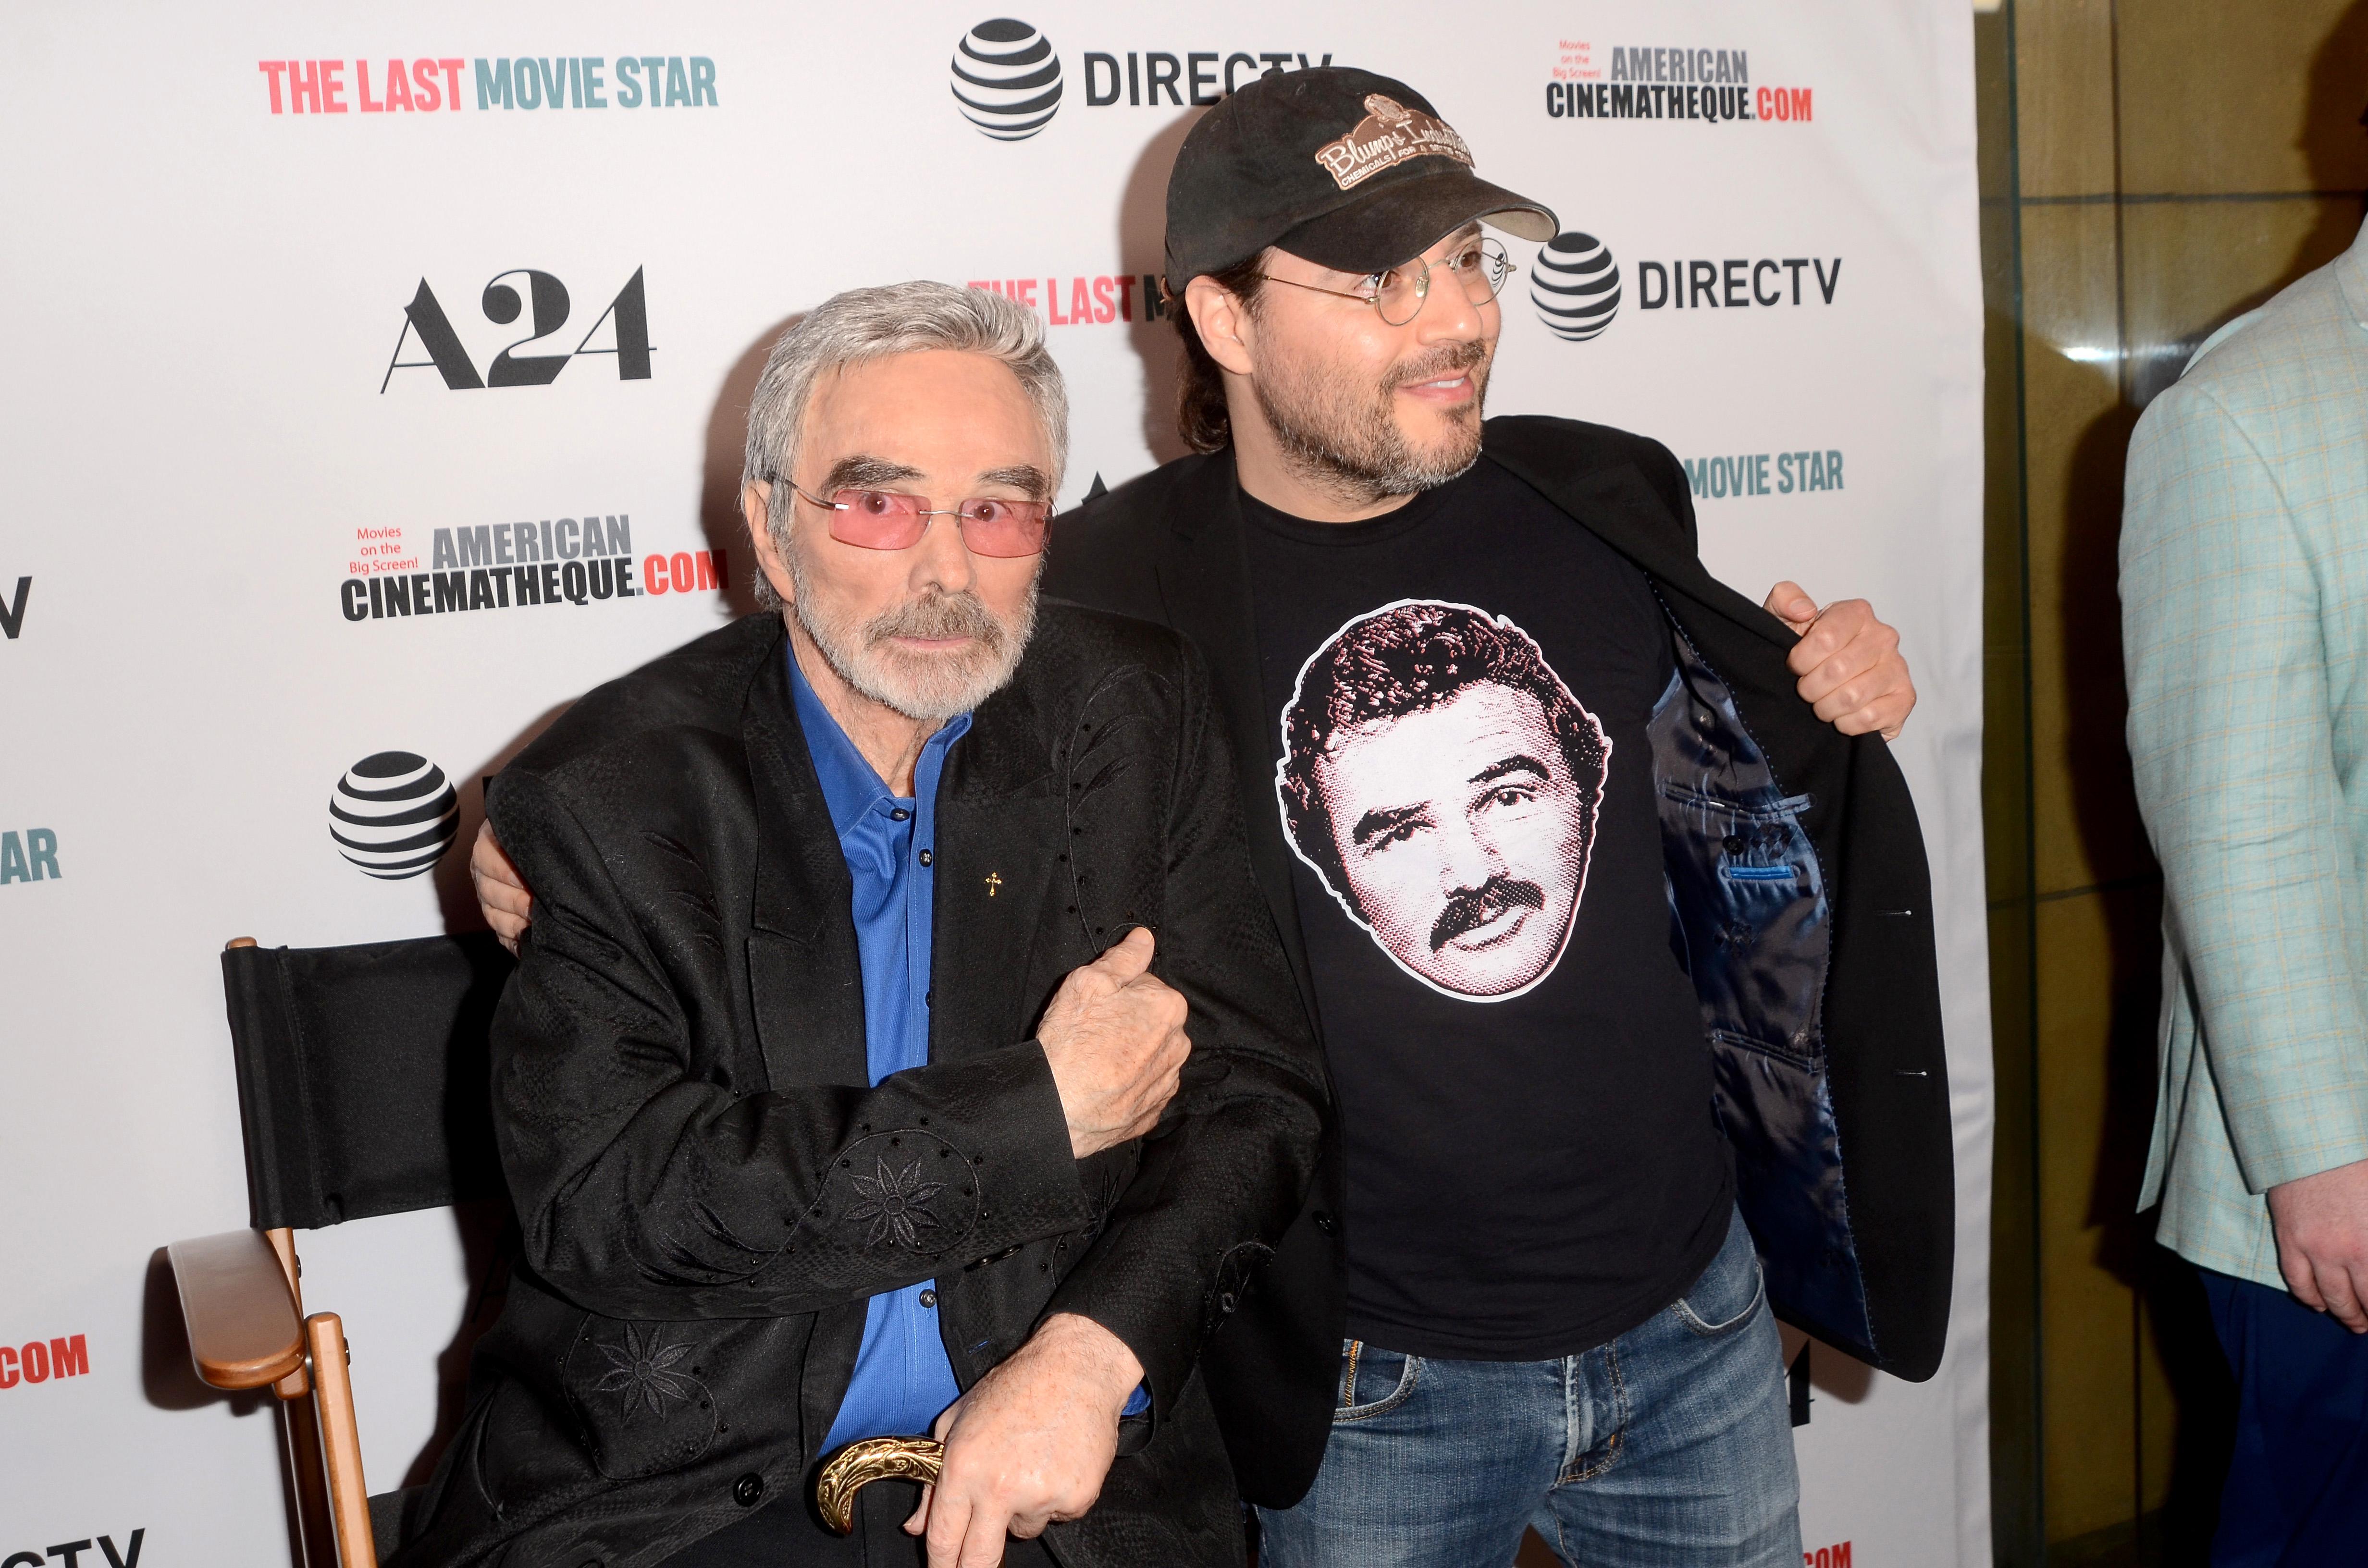 Burt Reynolds at Film Premier